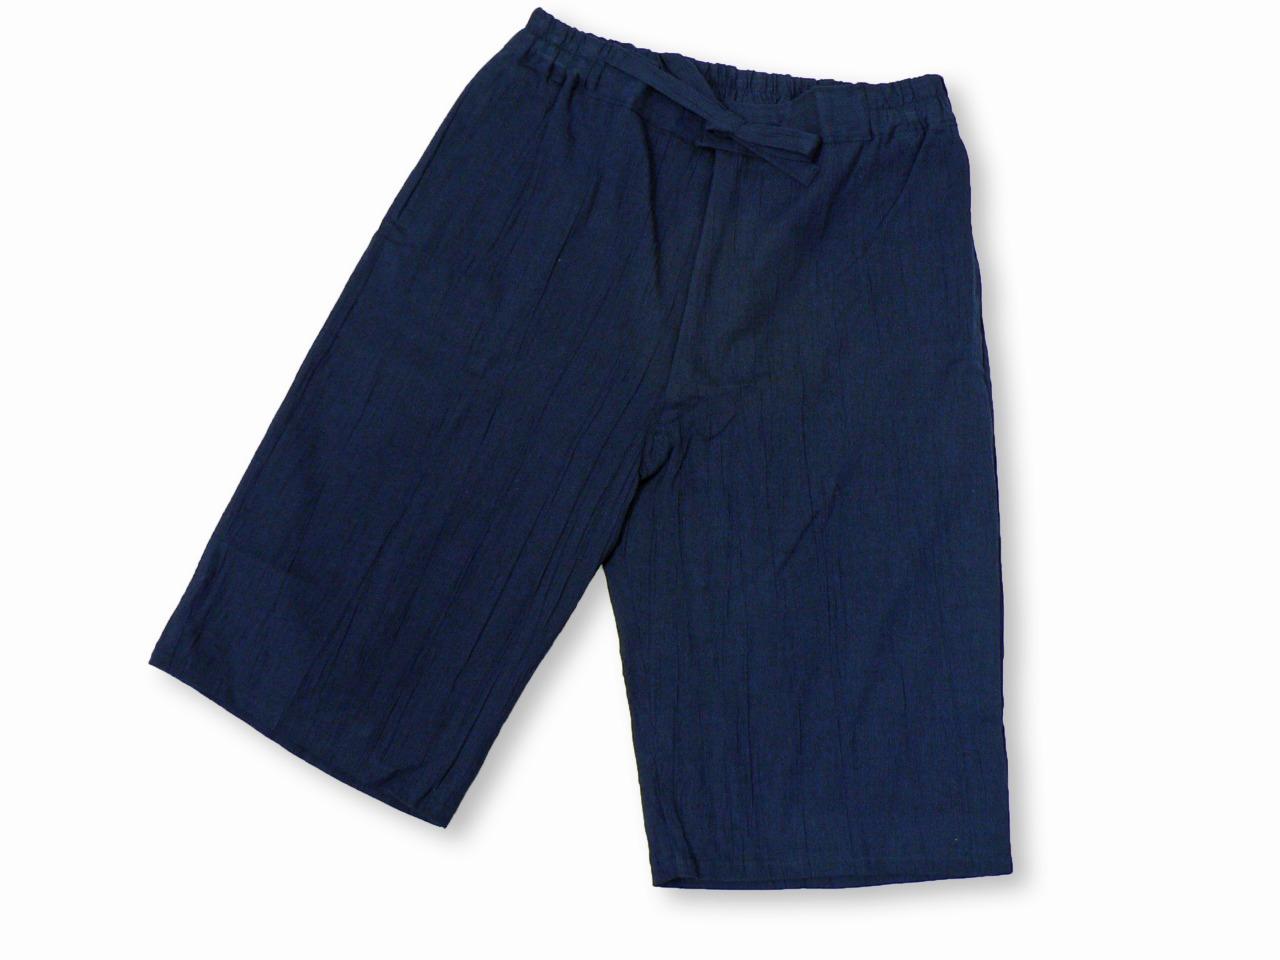 綿麻楊柳甚平(日本製) 濃紺 ズボン